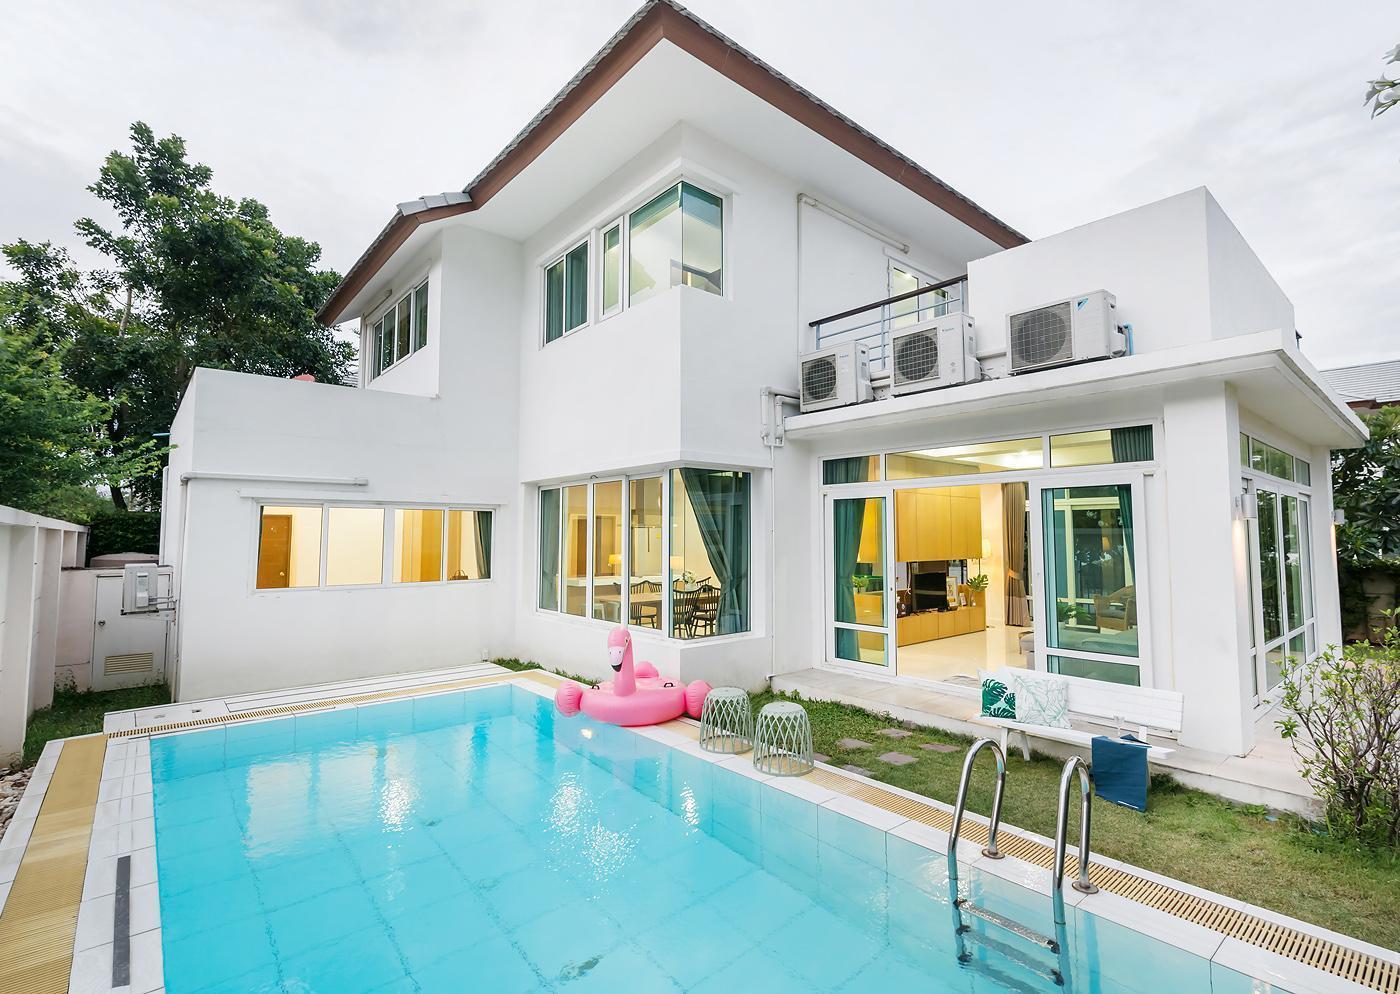 AnBBeach front Pool villa Pattaya with 4BR&5 Bath AnBBeach front Pool villa Pattaya with 4BR&5 Bath